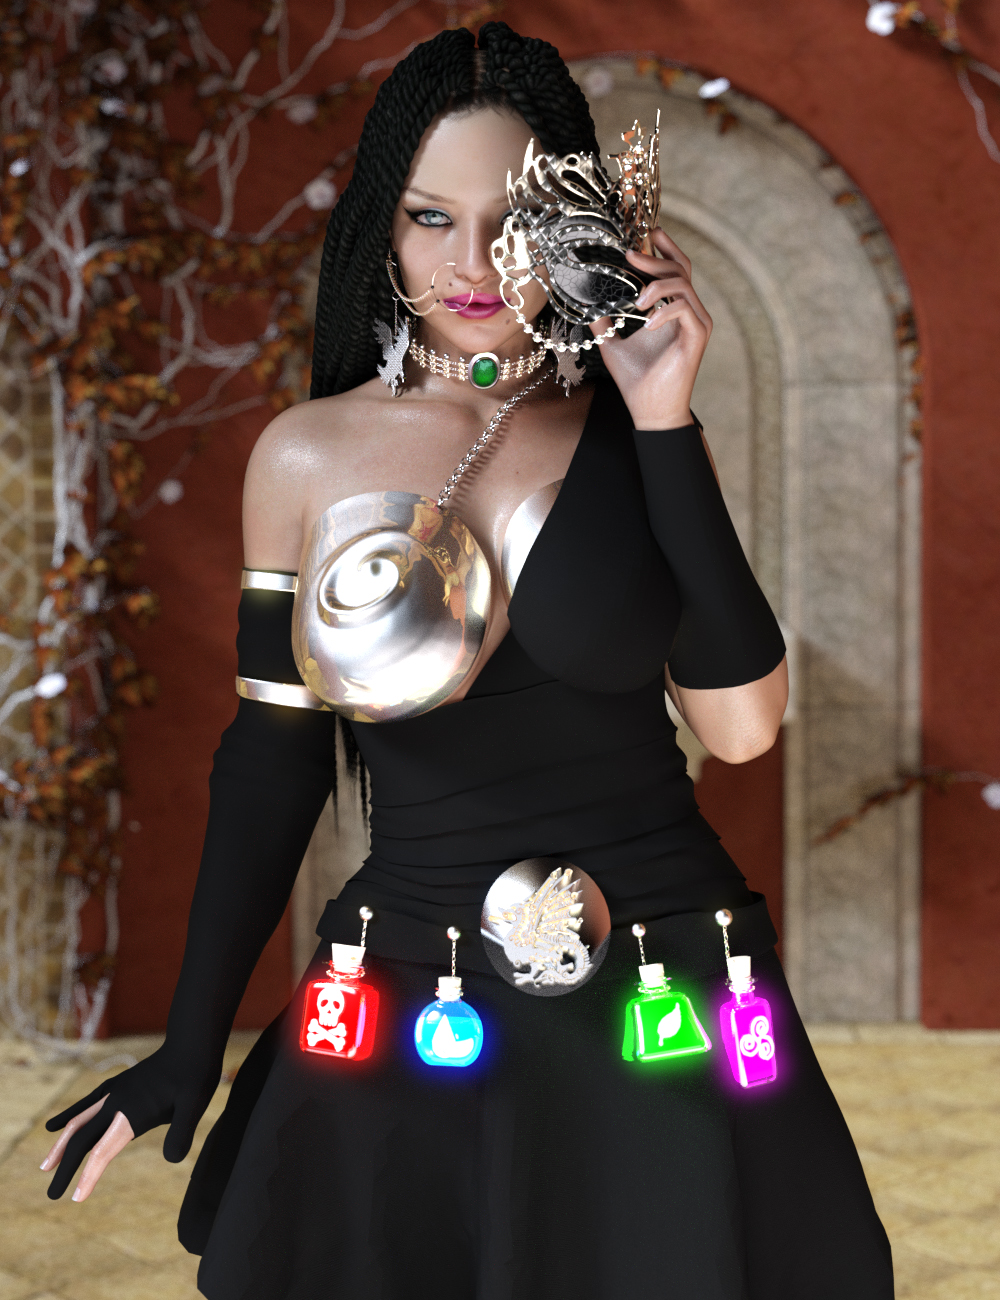 dForce Xanadu Outfit by: ParallaxCreatesParallaxCreates, 3D Models by Daz 3D